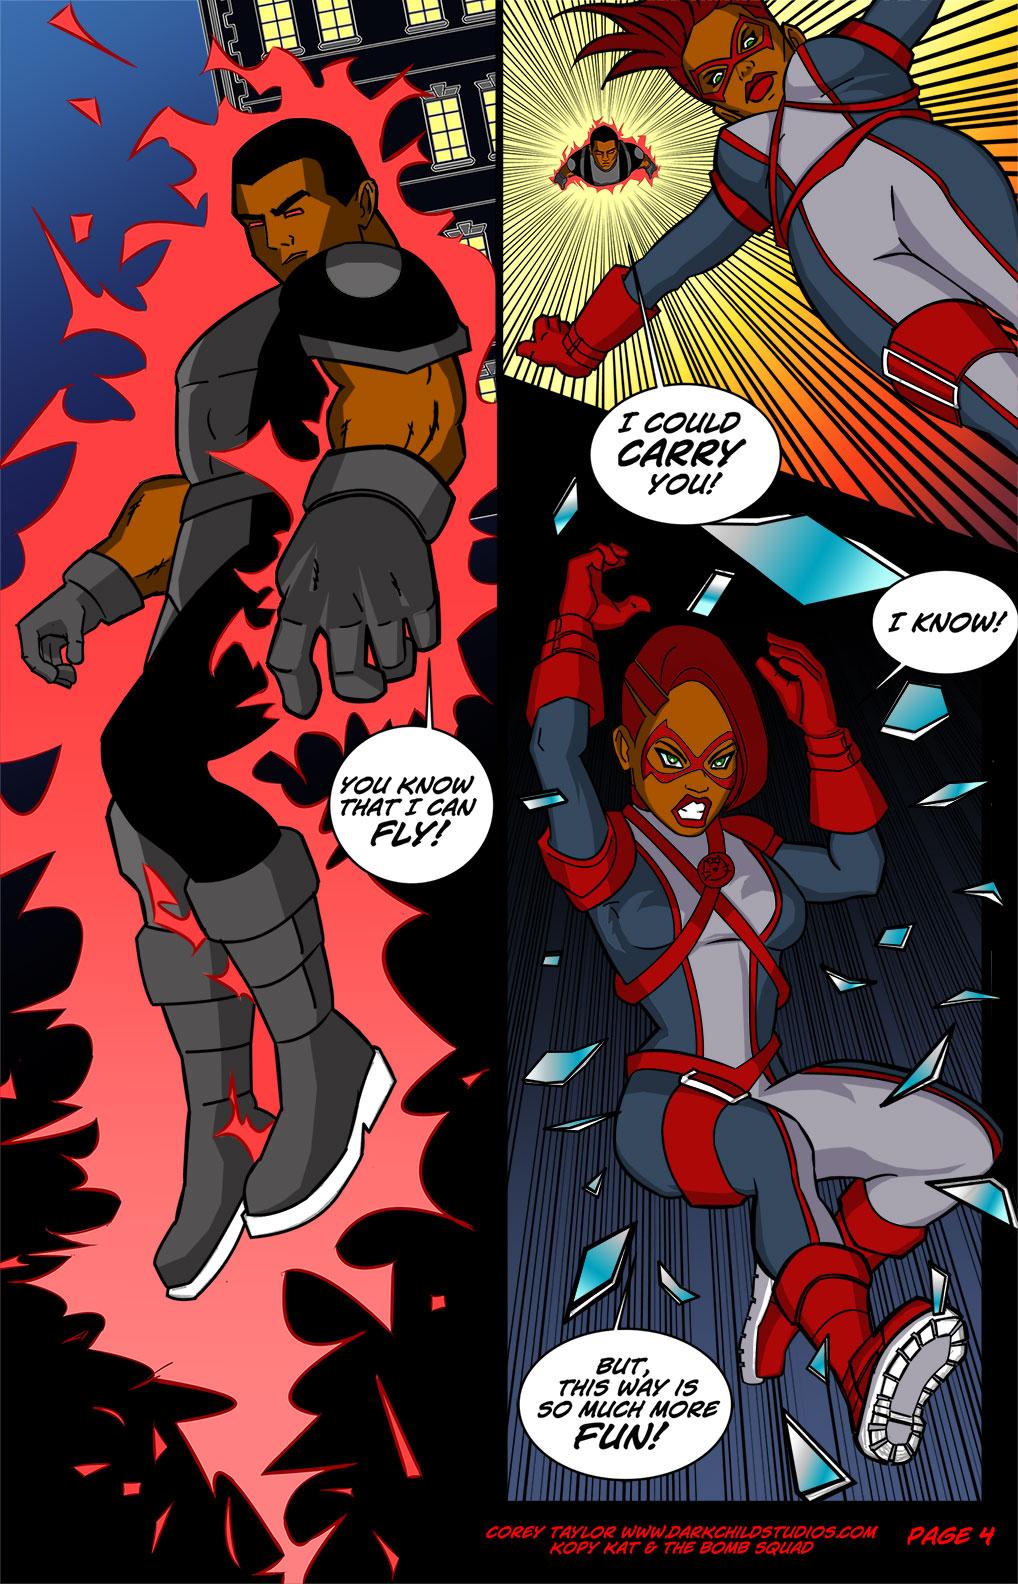 page-5-08-Mar-2015-final-color-2